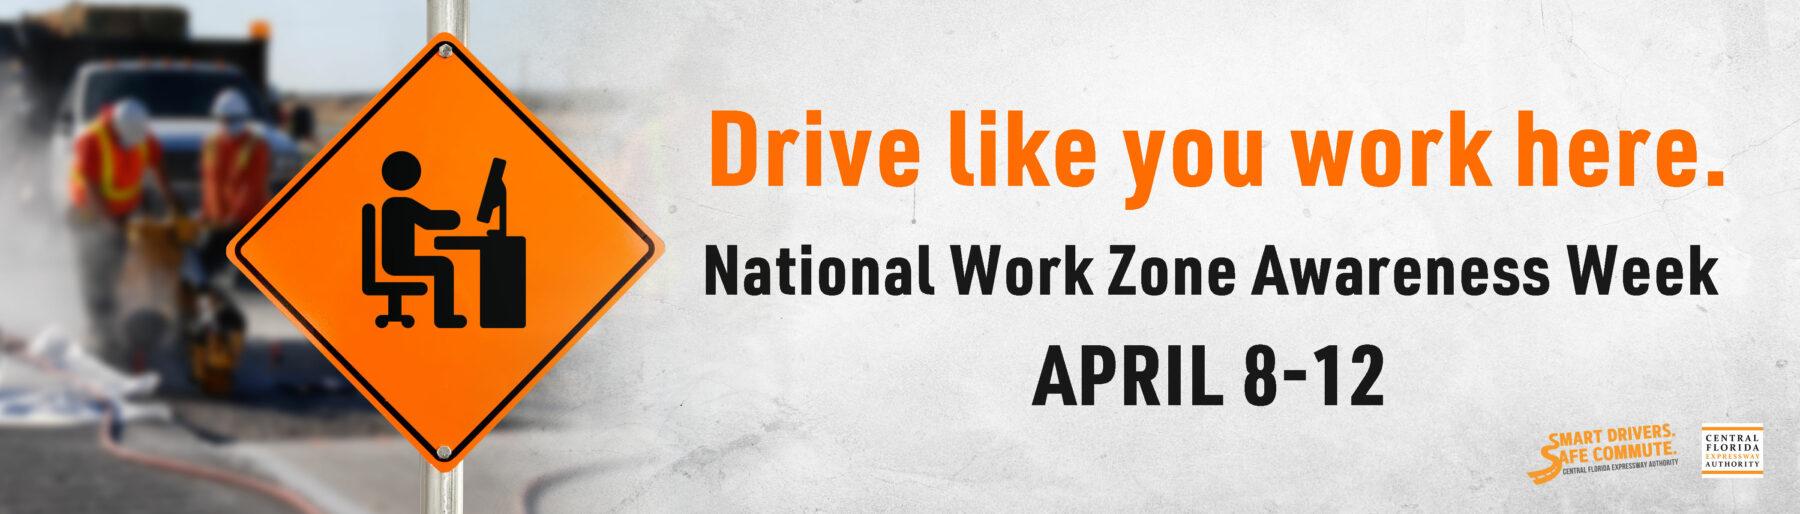 Drive like you work here: National Work Zone Awareness Week April 8-12, 2019